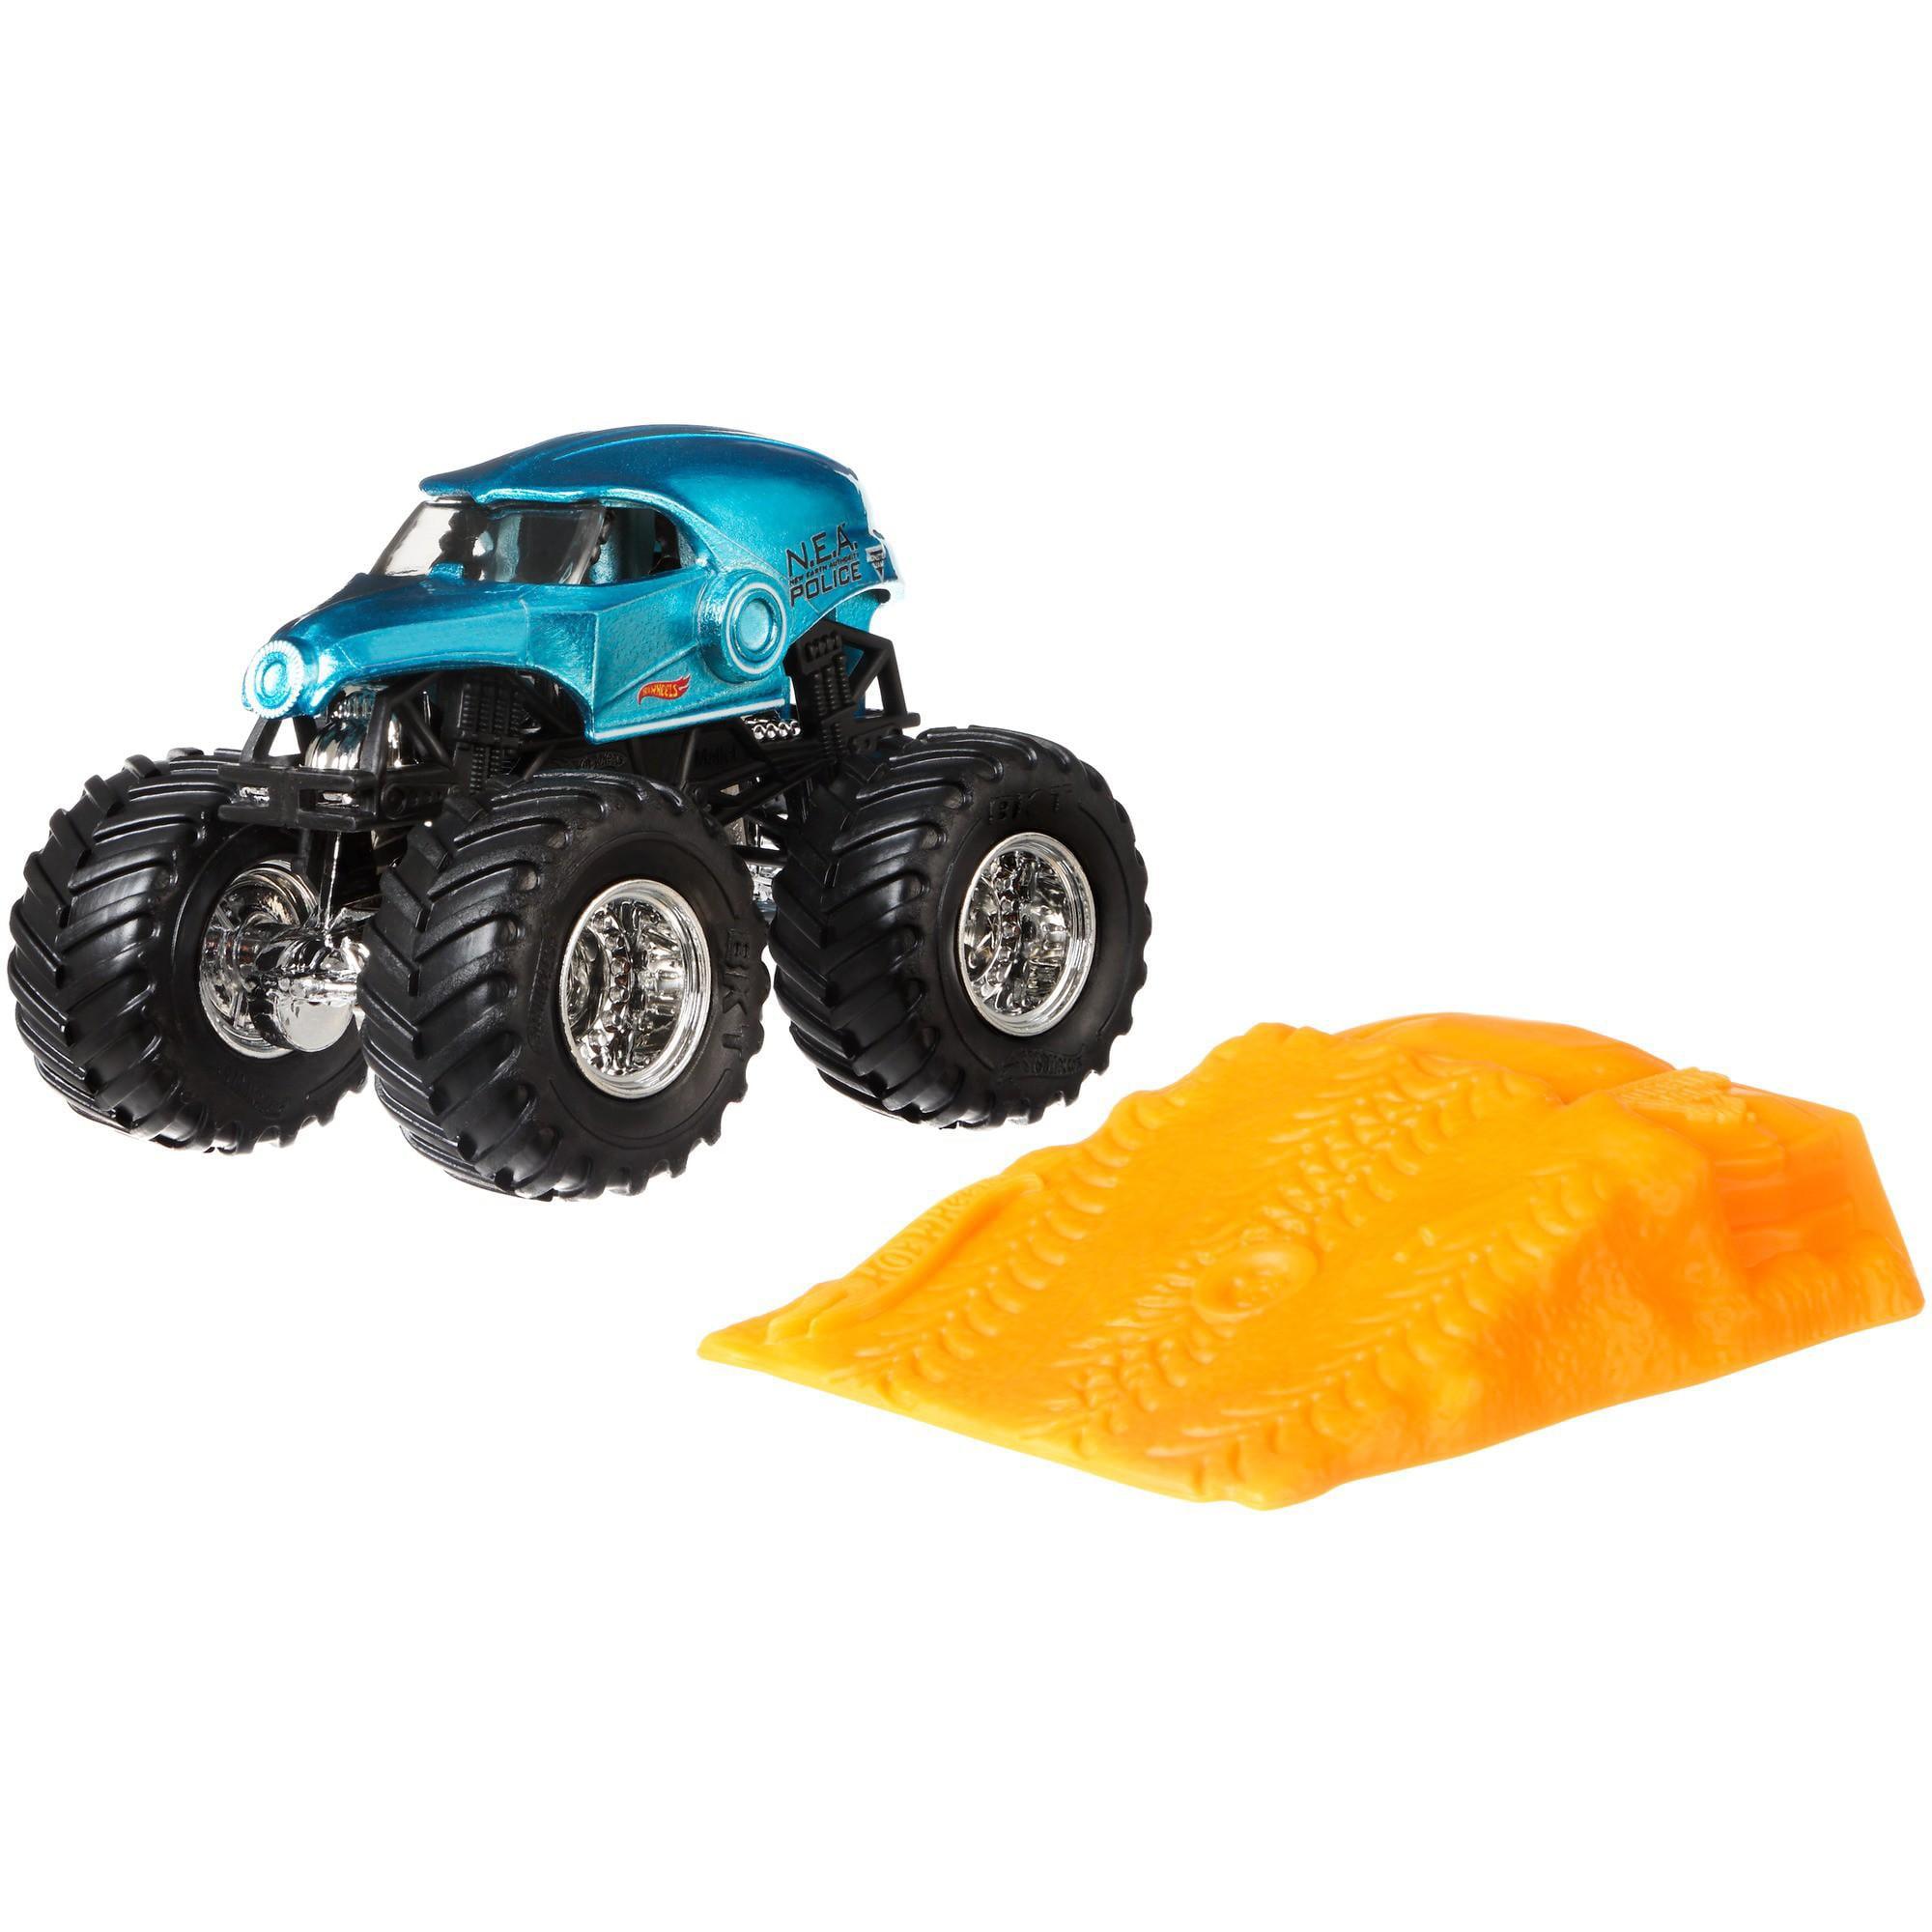 Hot Wheels Monster Jam N.E.A. Police Vehicle by Mattel